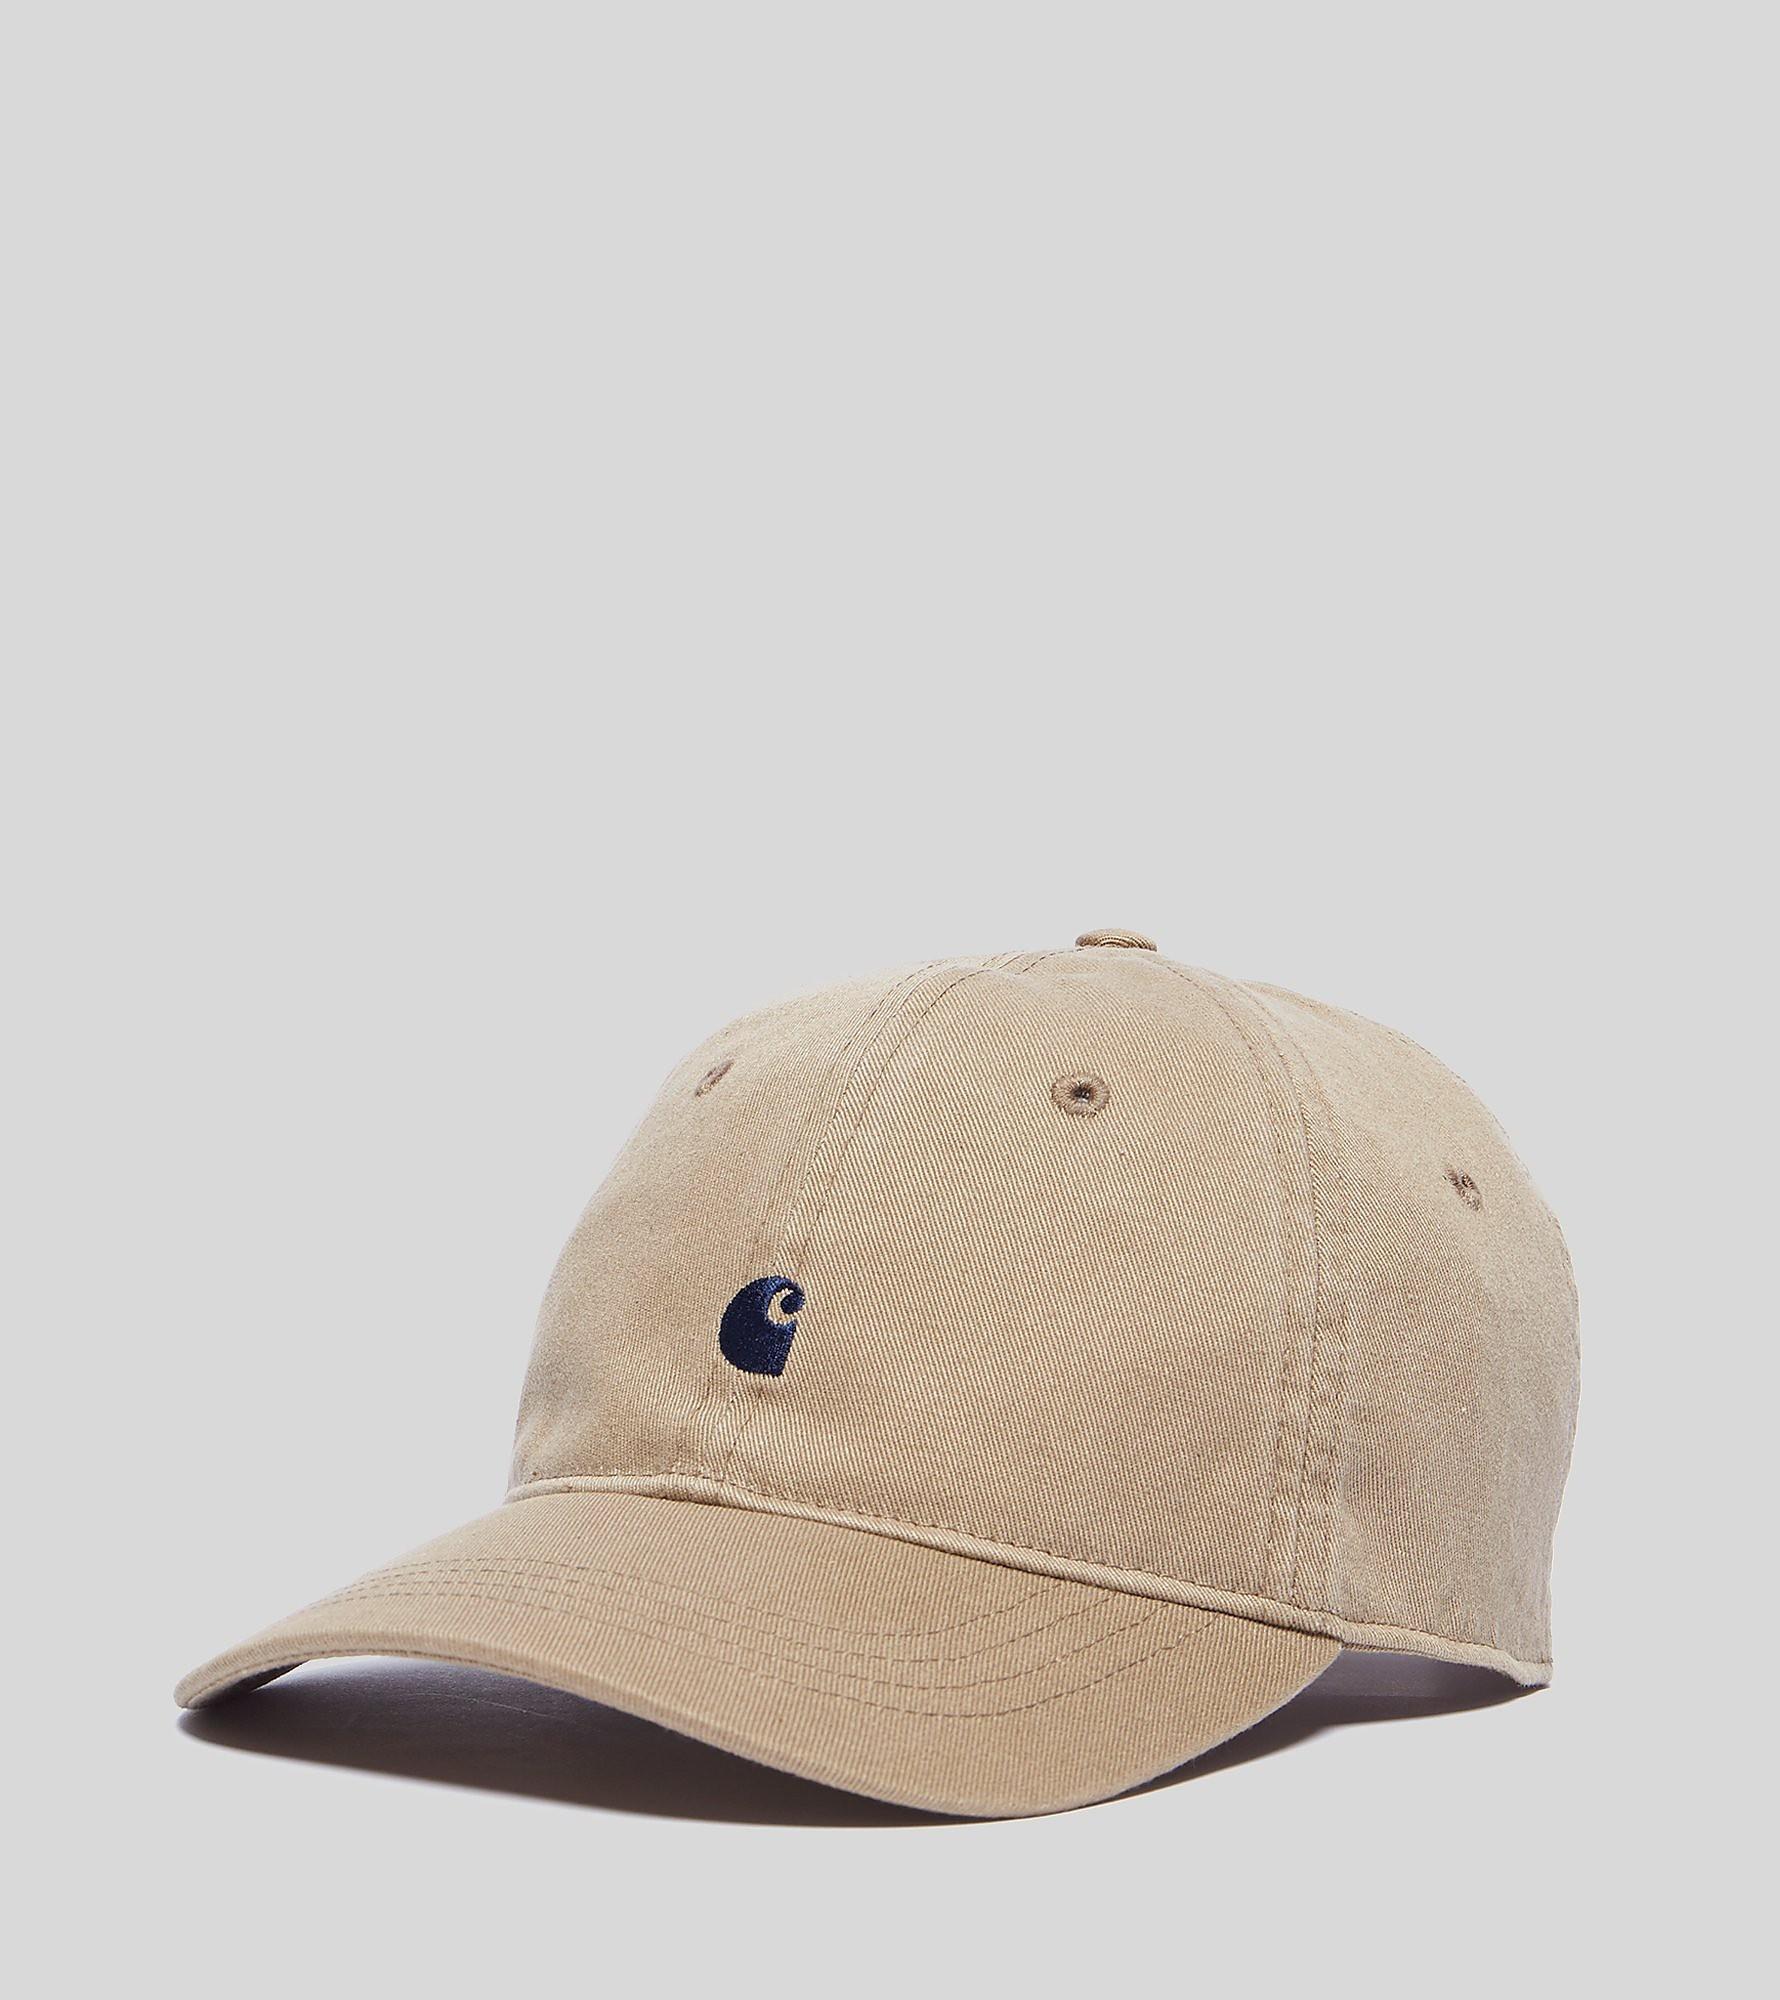 Carhartt WIP Madison Cap, marrón